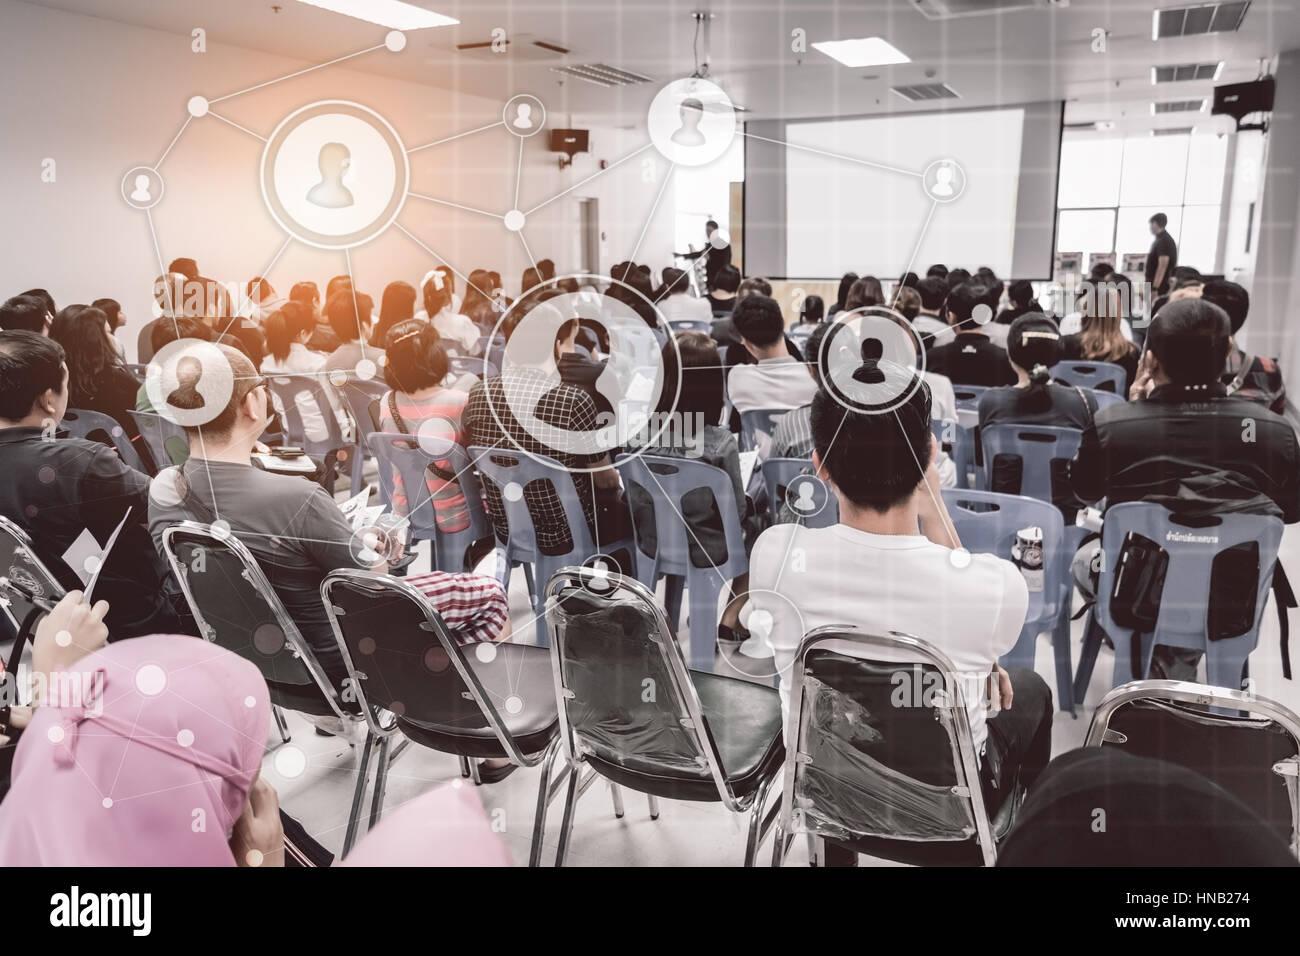 Seminar Icon Stockfotos & Seminar Icon Bilder - Alamy